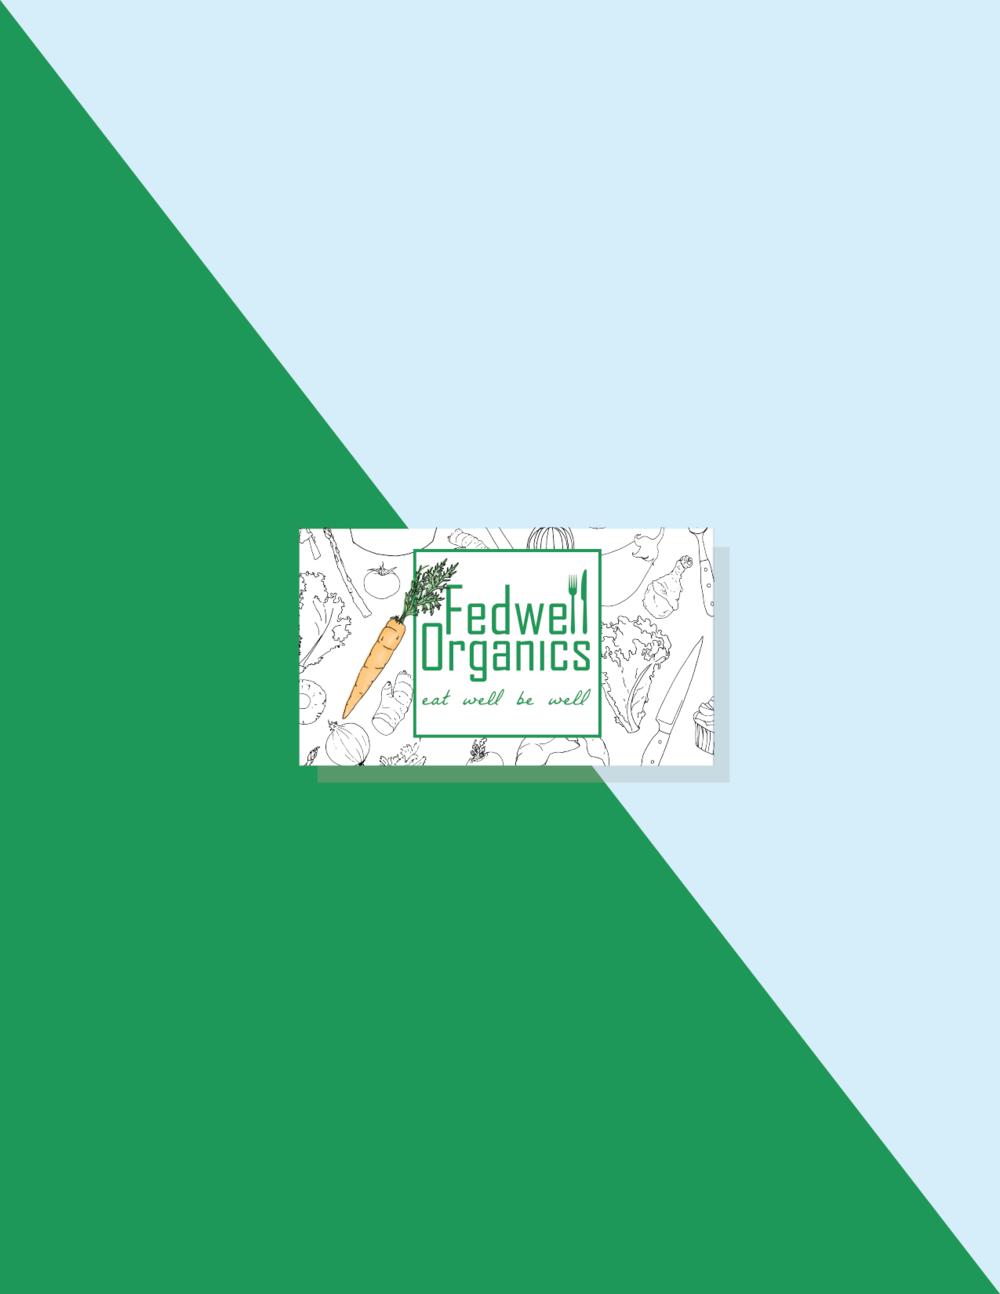 business card pic fedwell organics-01.png